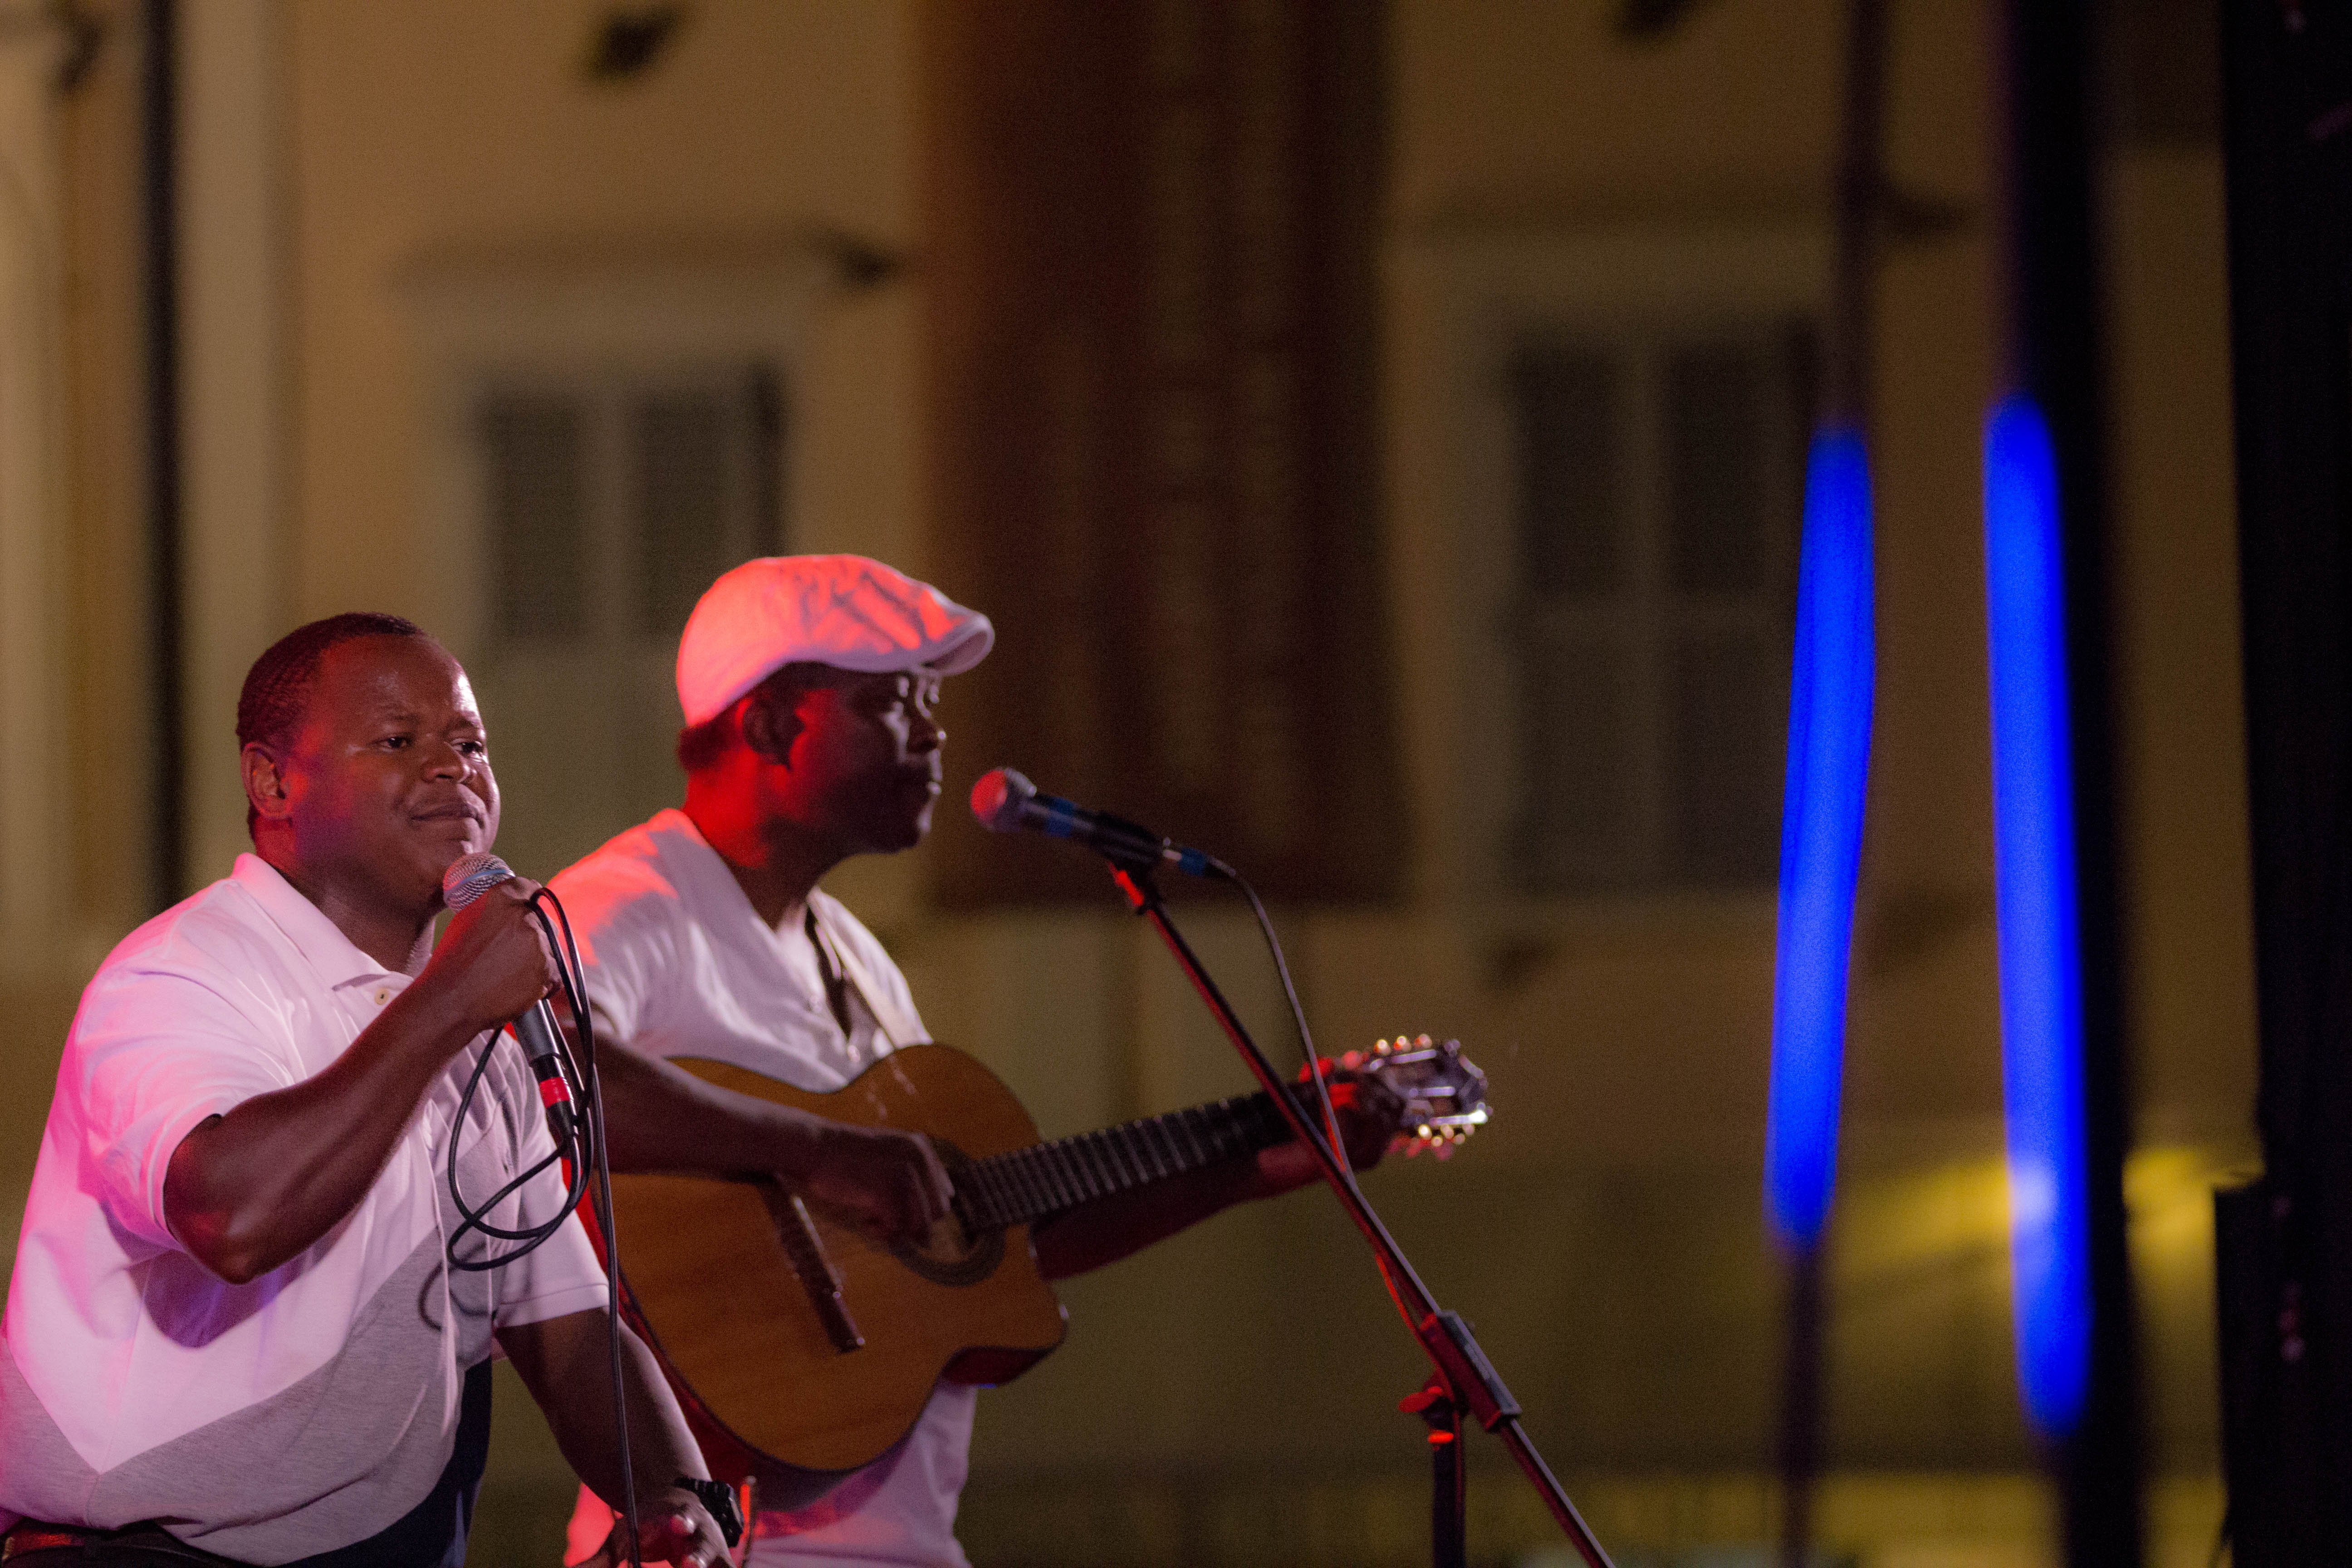 7Luas Maio Band @ Festival Sete Sóis Sete Luas 17.7.2019